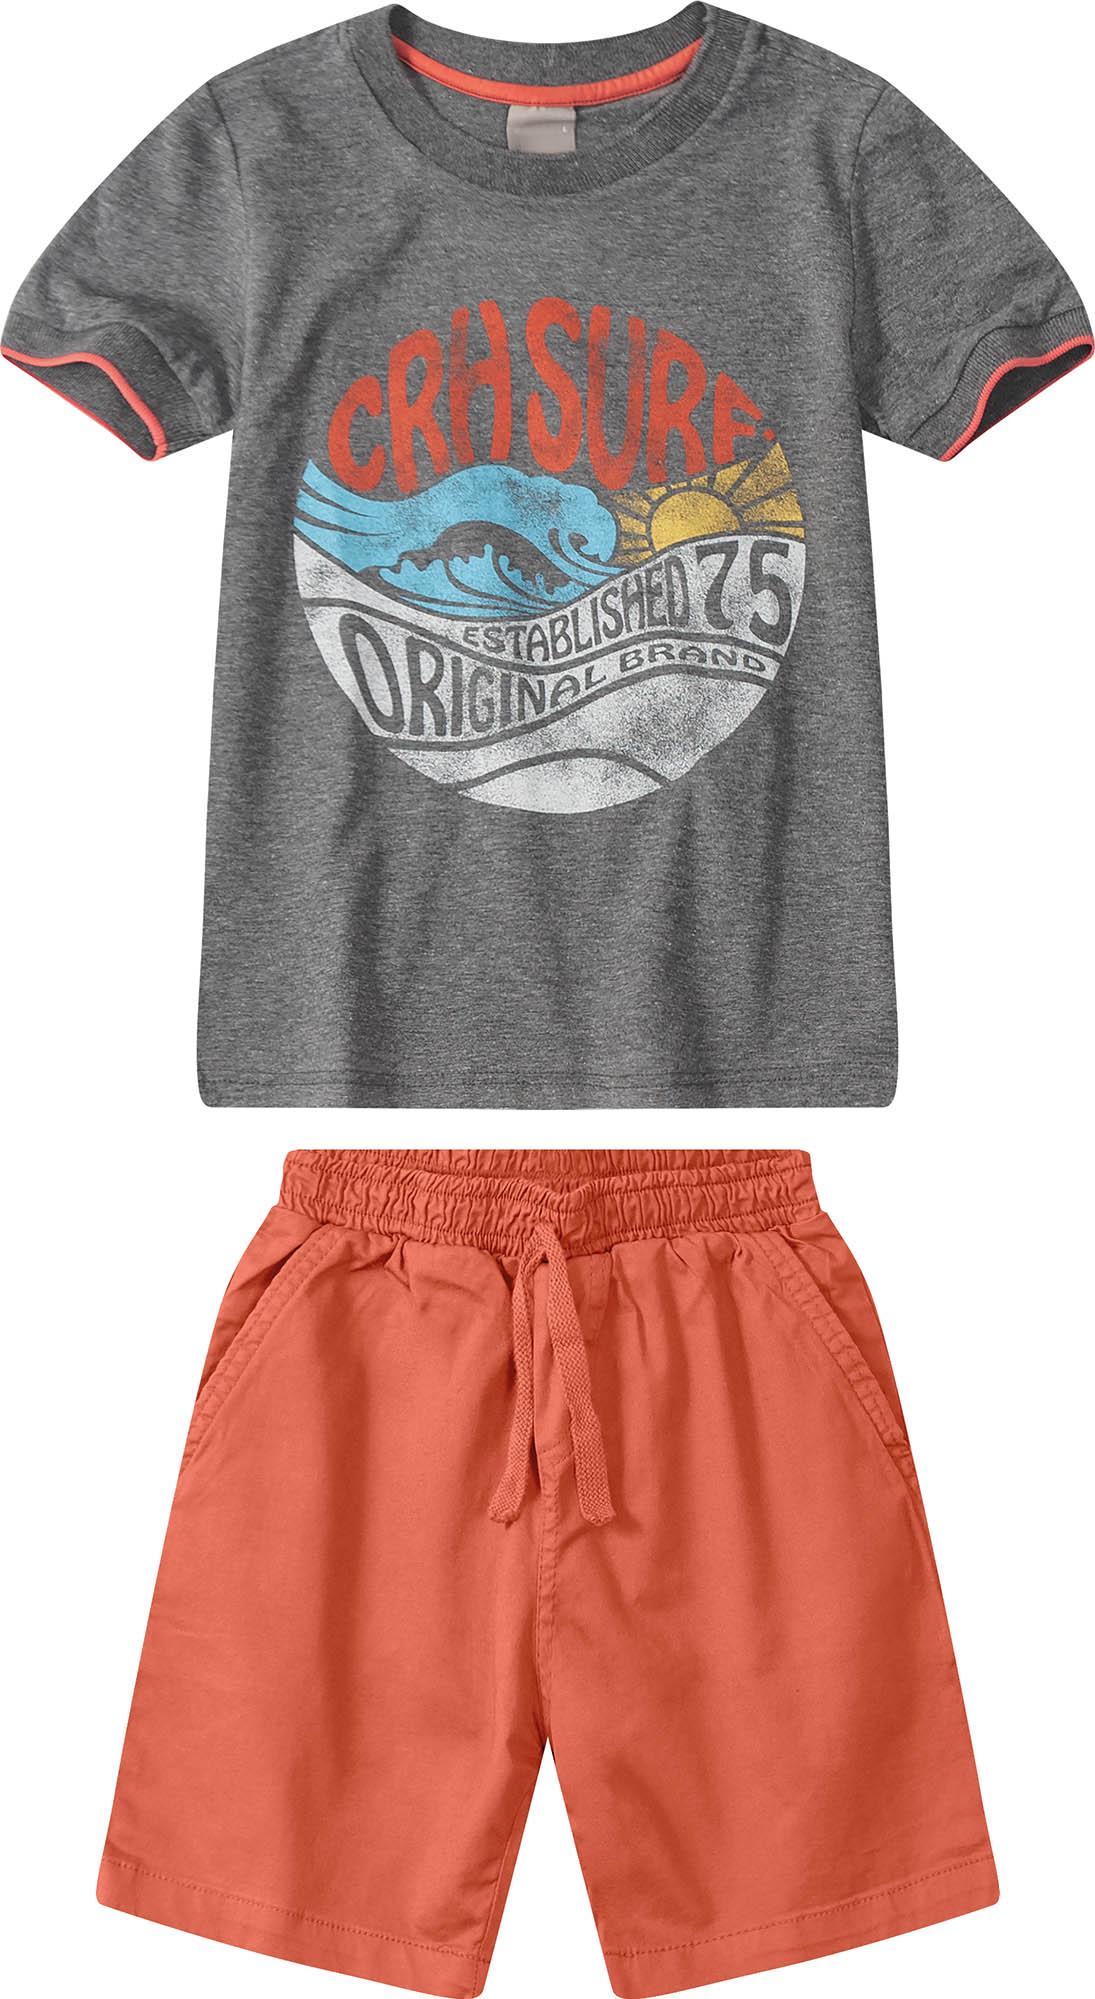 Conjunto Camiseta Cinza com Bermuda Laranja - Tam 04 e 06 anos